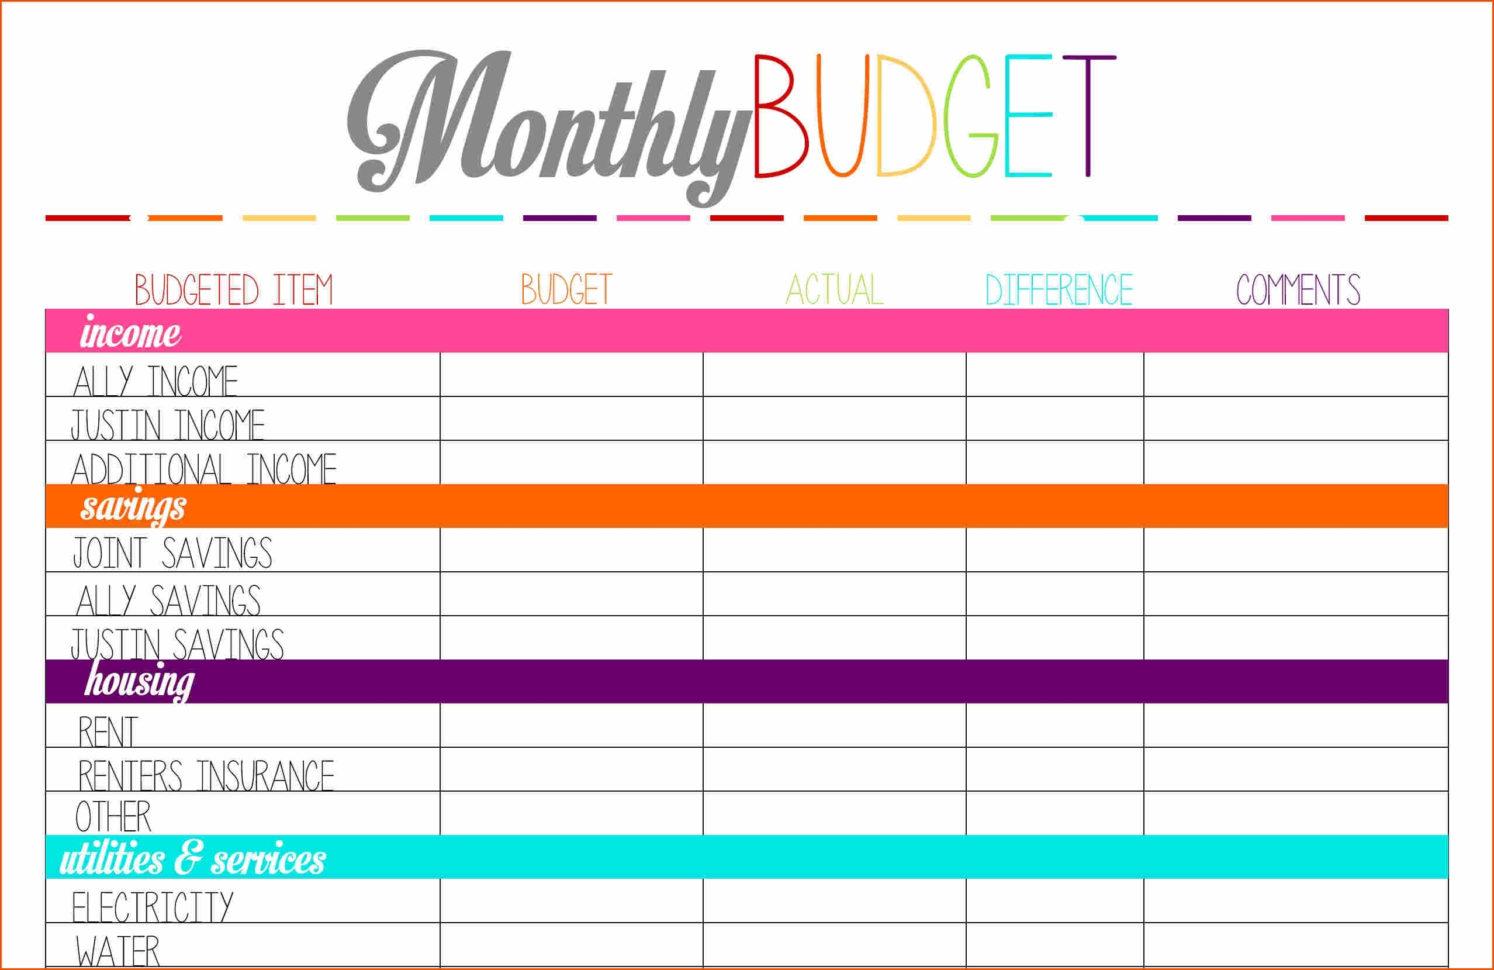 Budget Worksheet Printablememo Templates Word